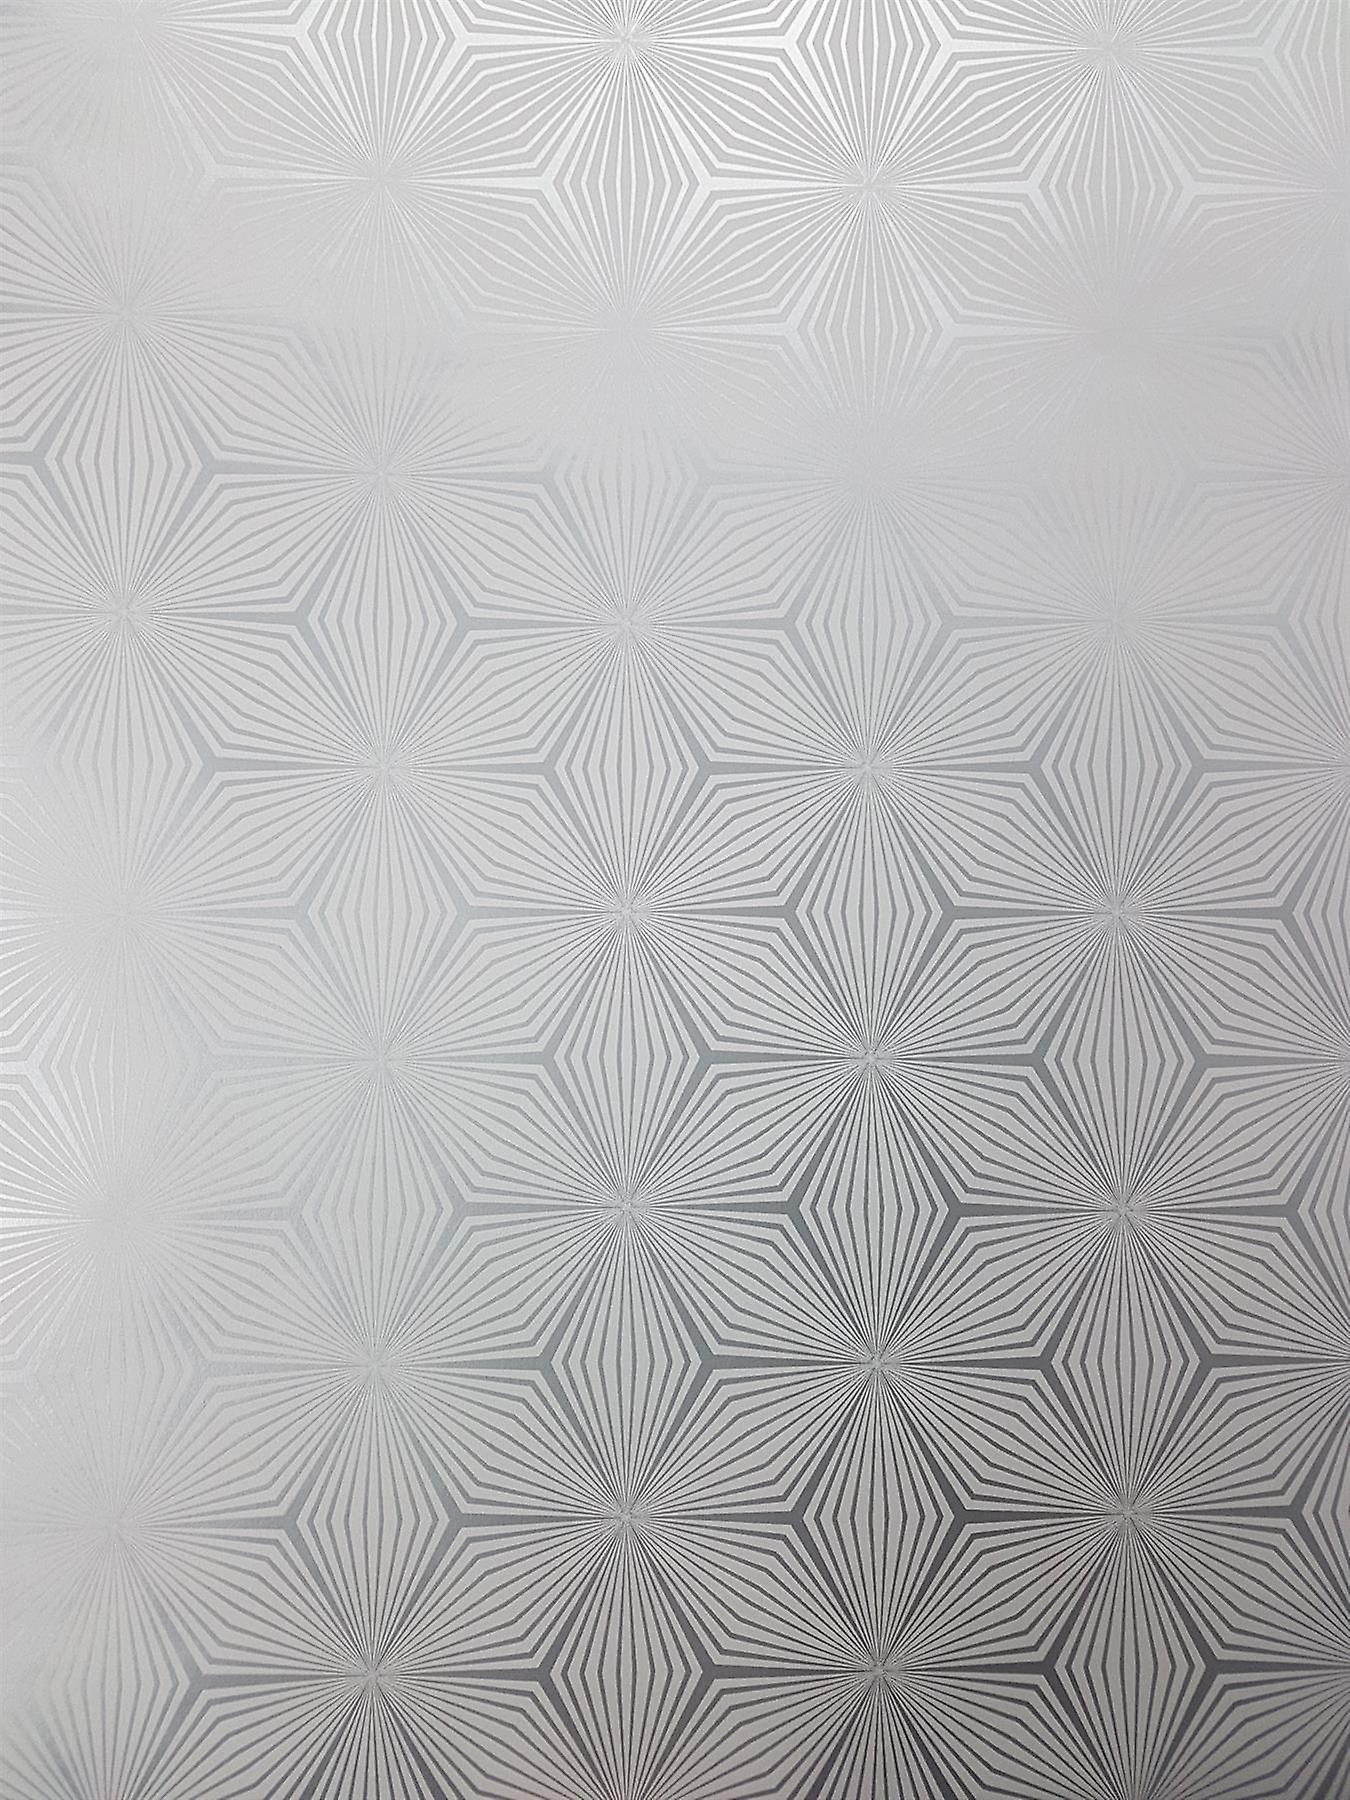 Geometric Star Metallic Wallpaper Grey Silver Shimmer Stripes Holden Sparkle